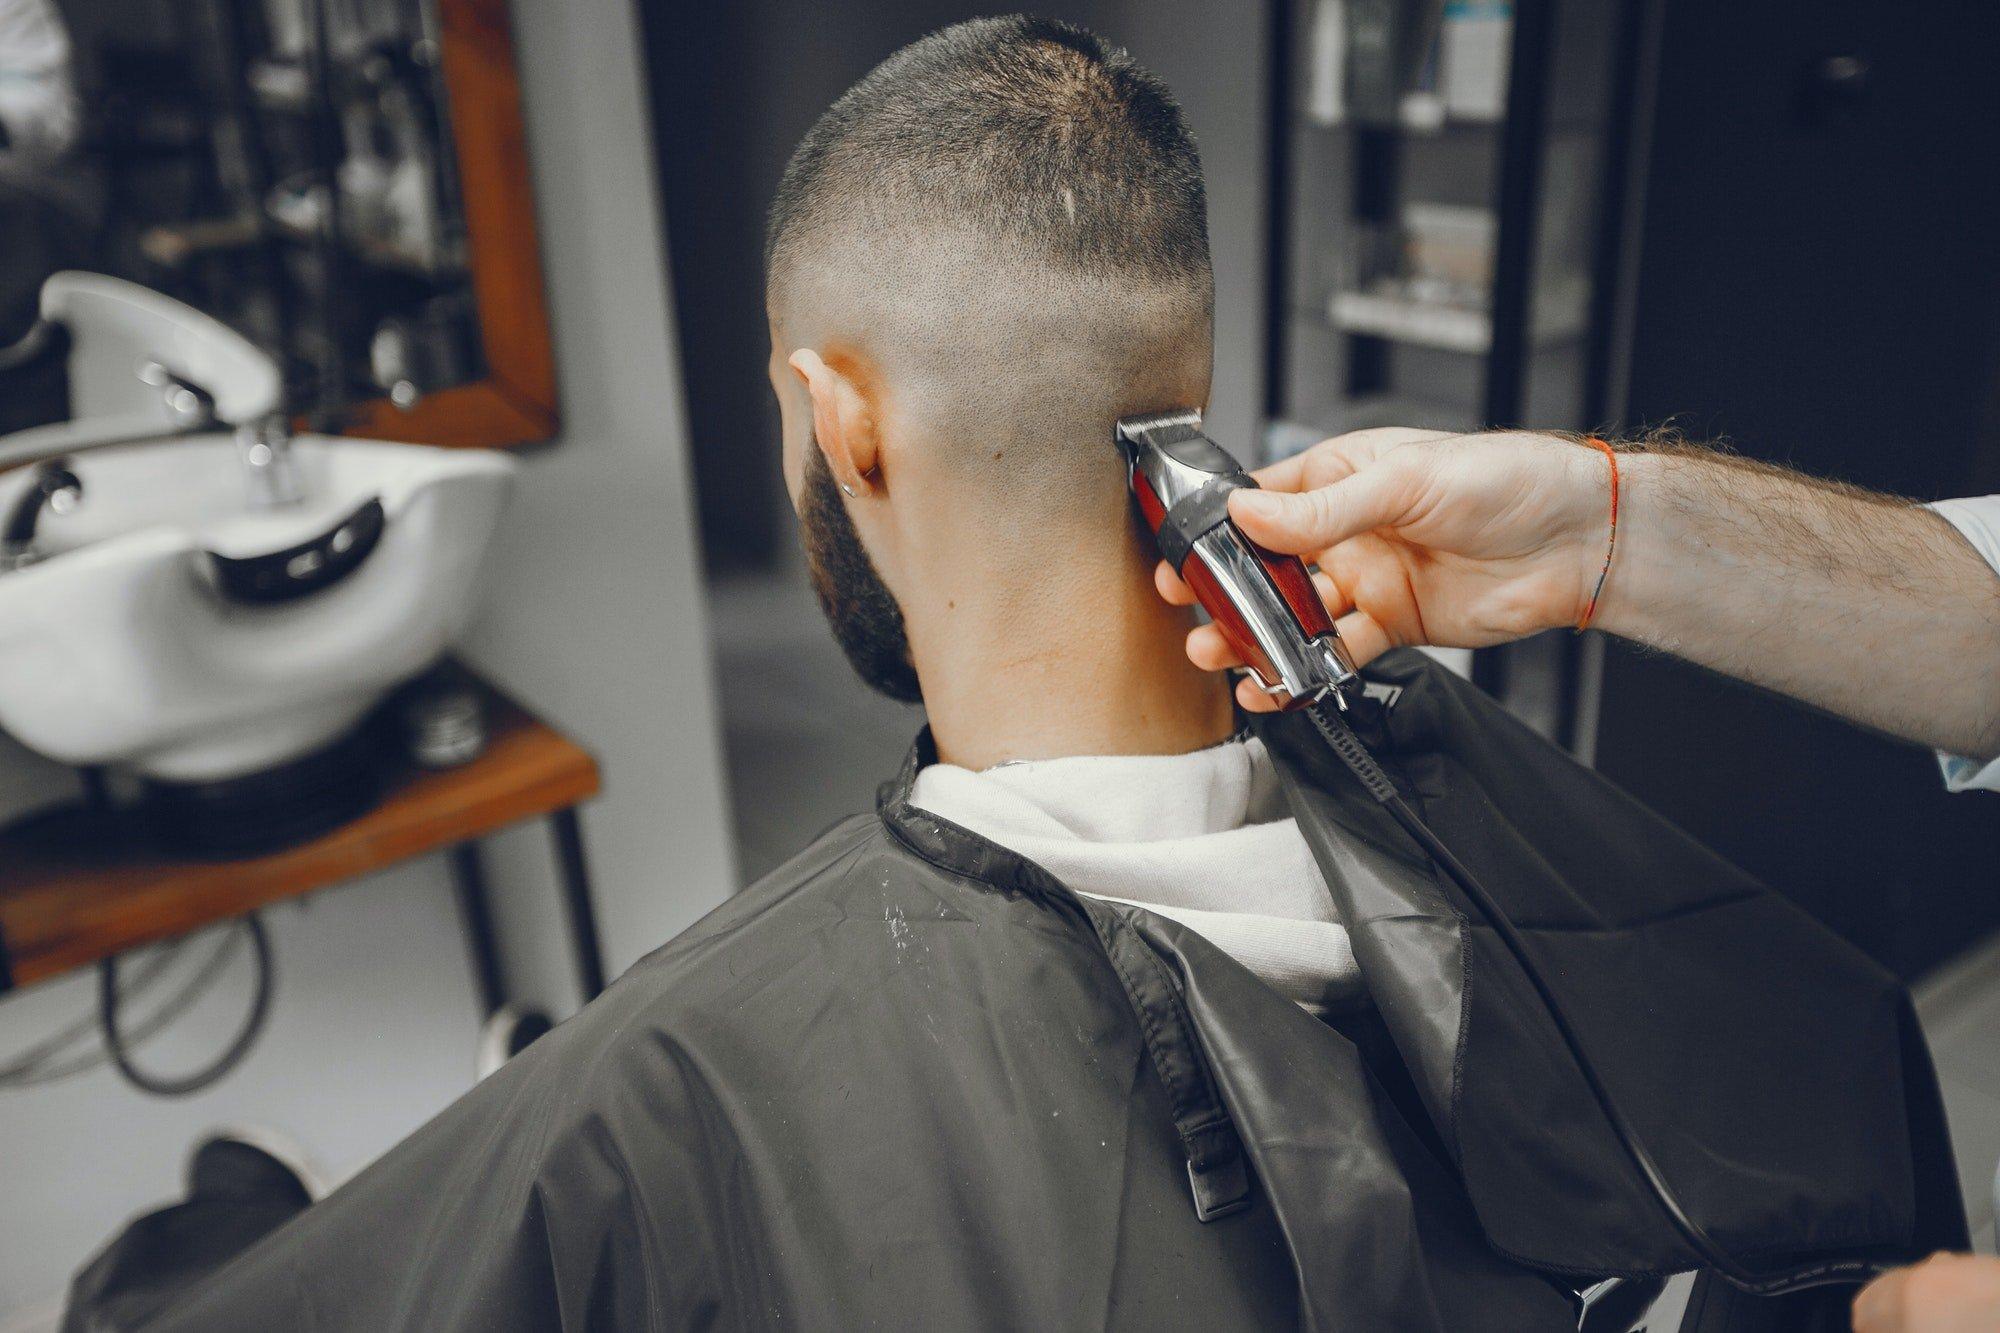 Consegues parar a queda de cabelo?